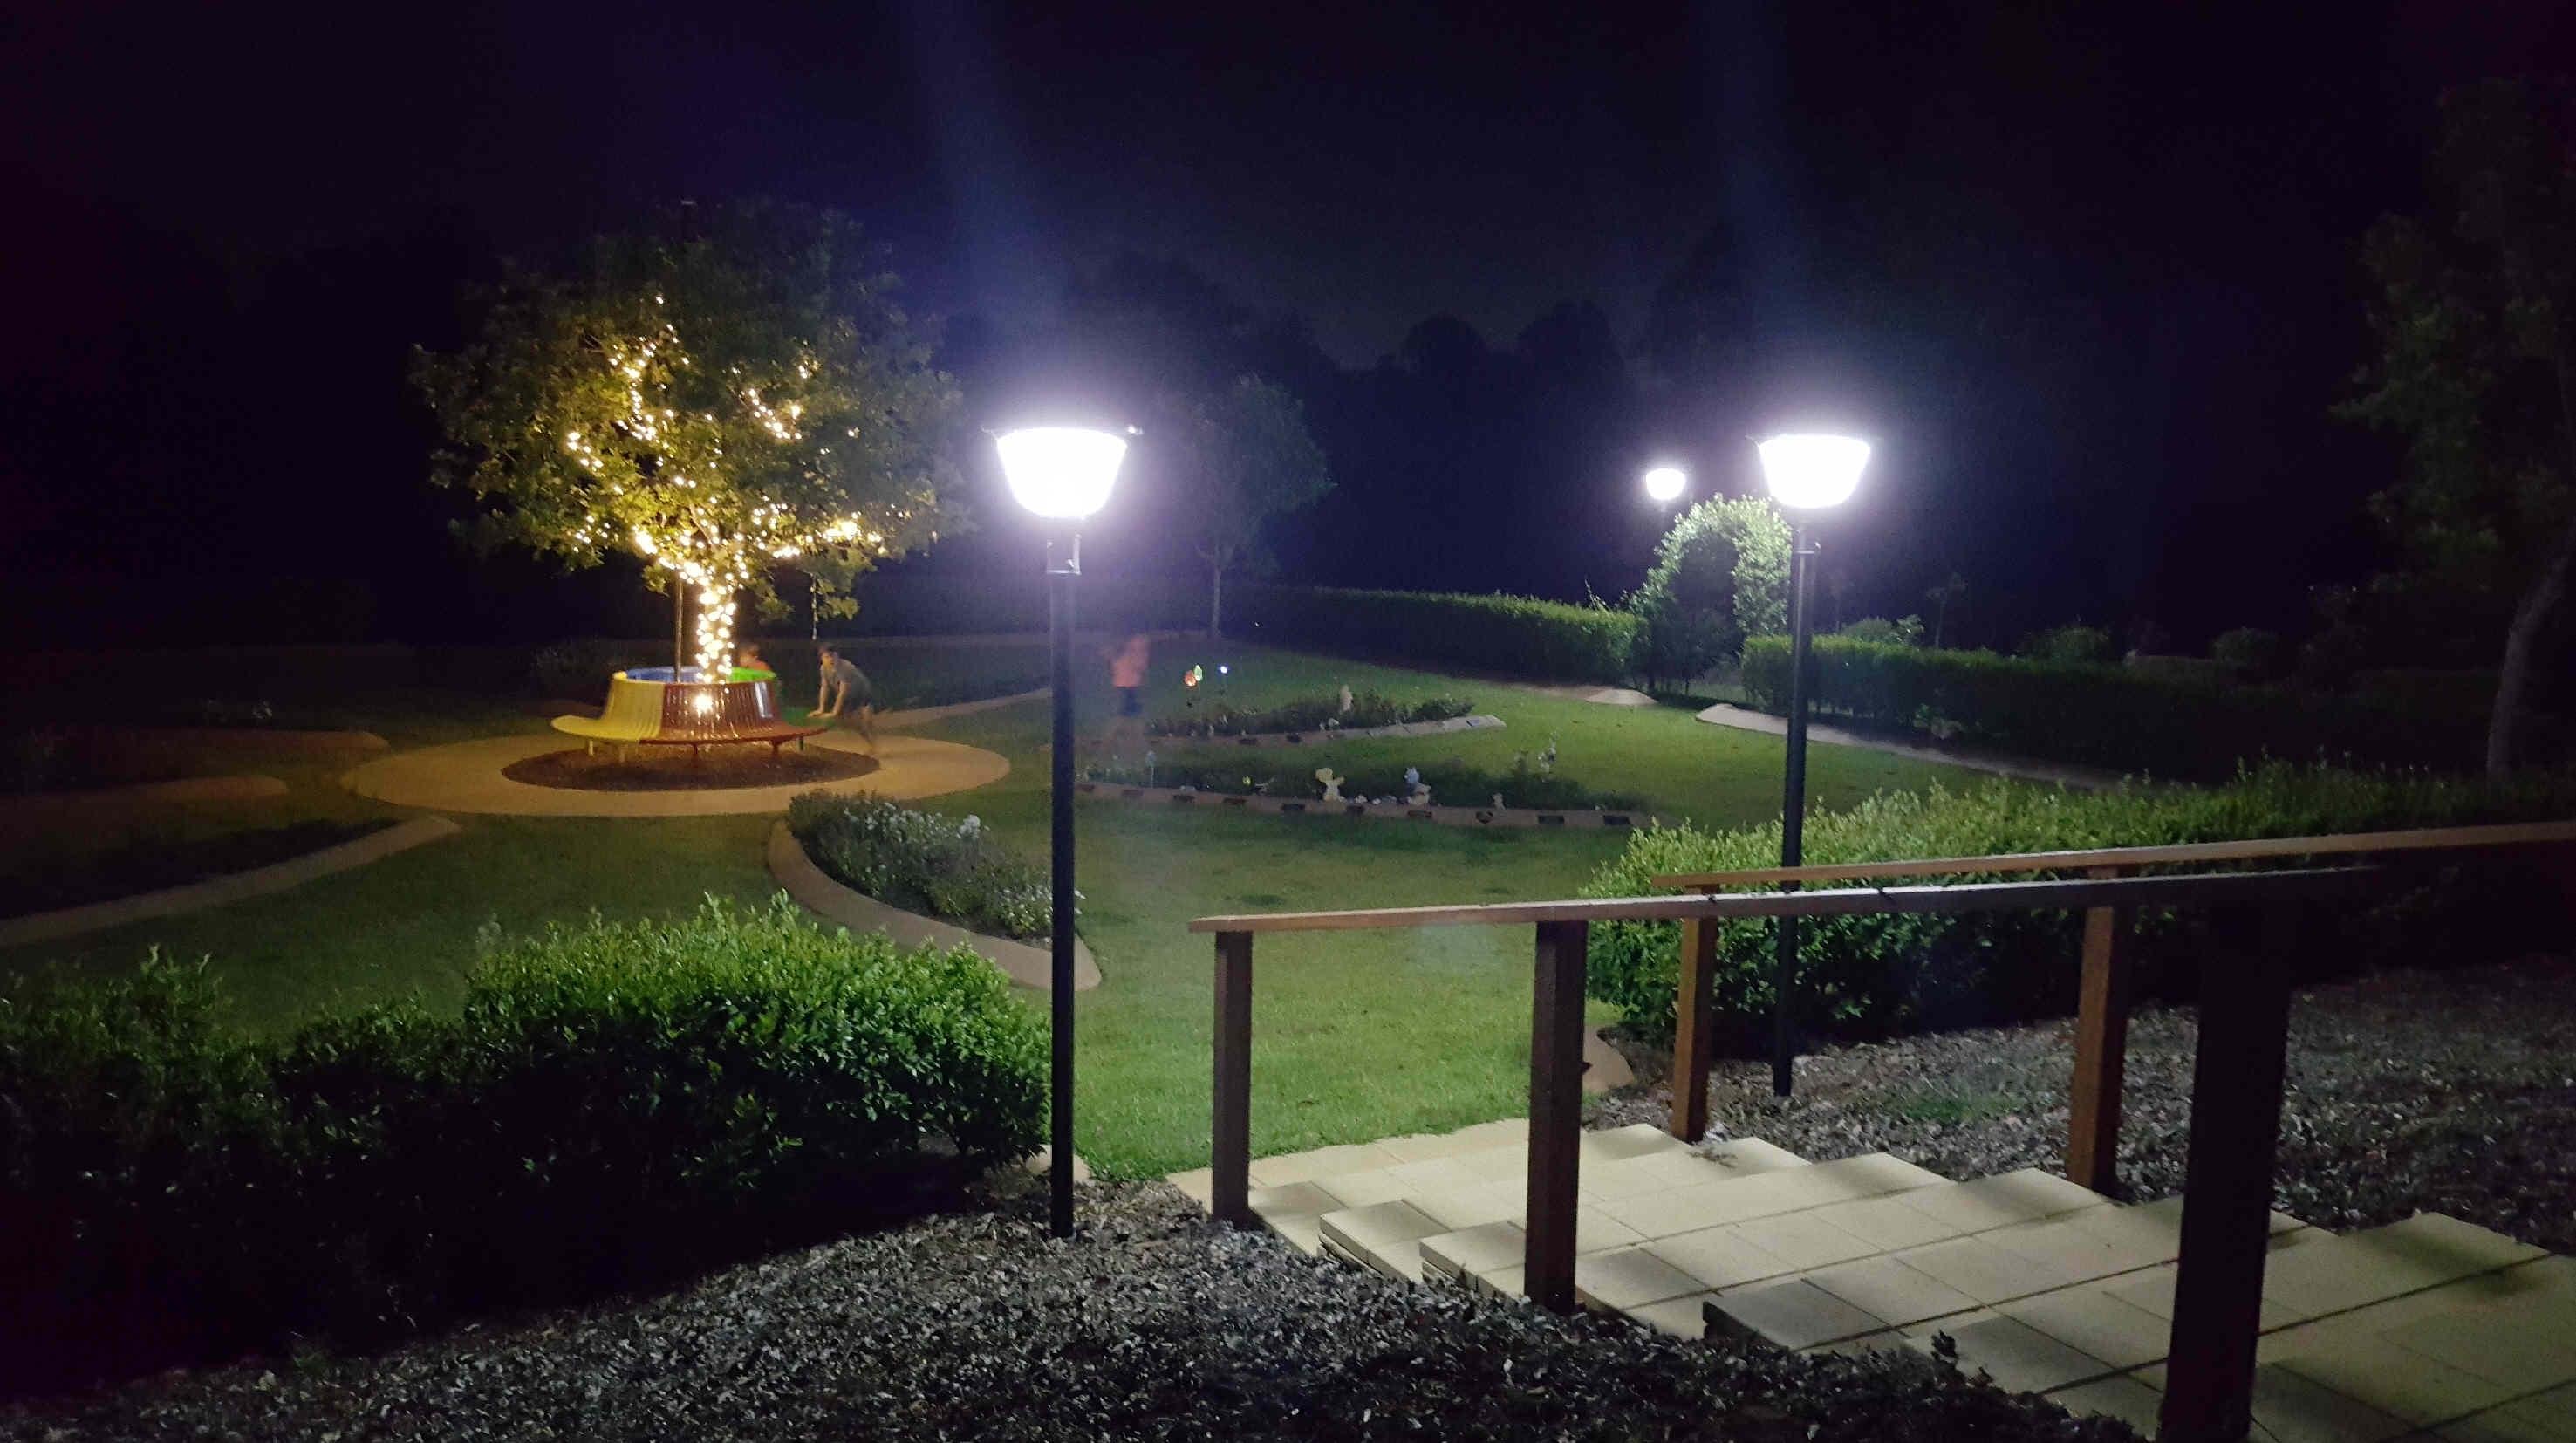 Buy Quality Solar Lights   Blackfrog Solar   Solar Lights With Regard To Contemporary Solar Garden Lighting Fixtures (#5 of 15)